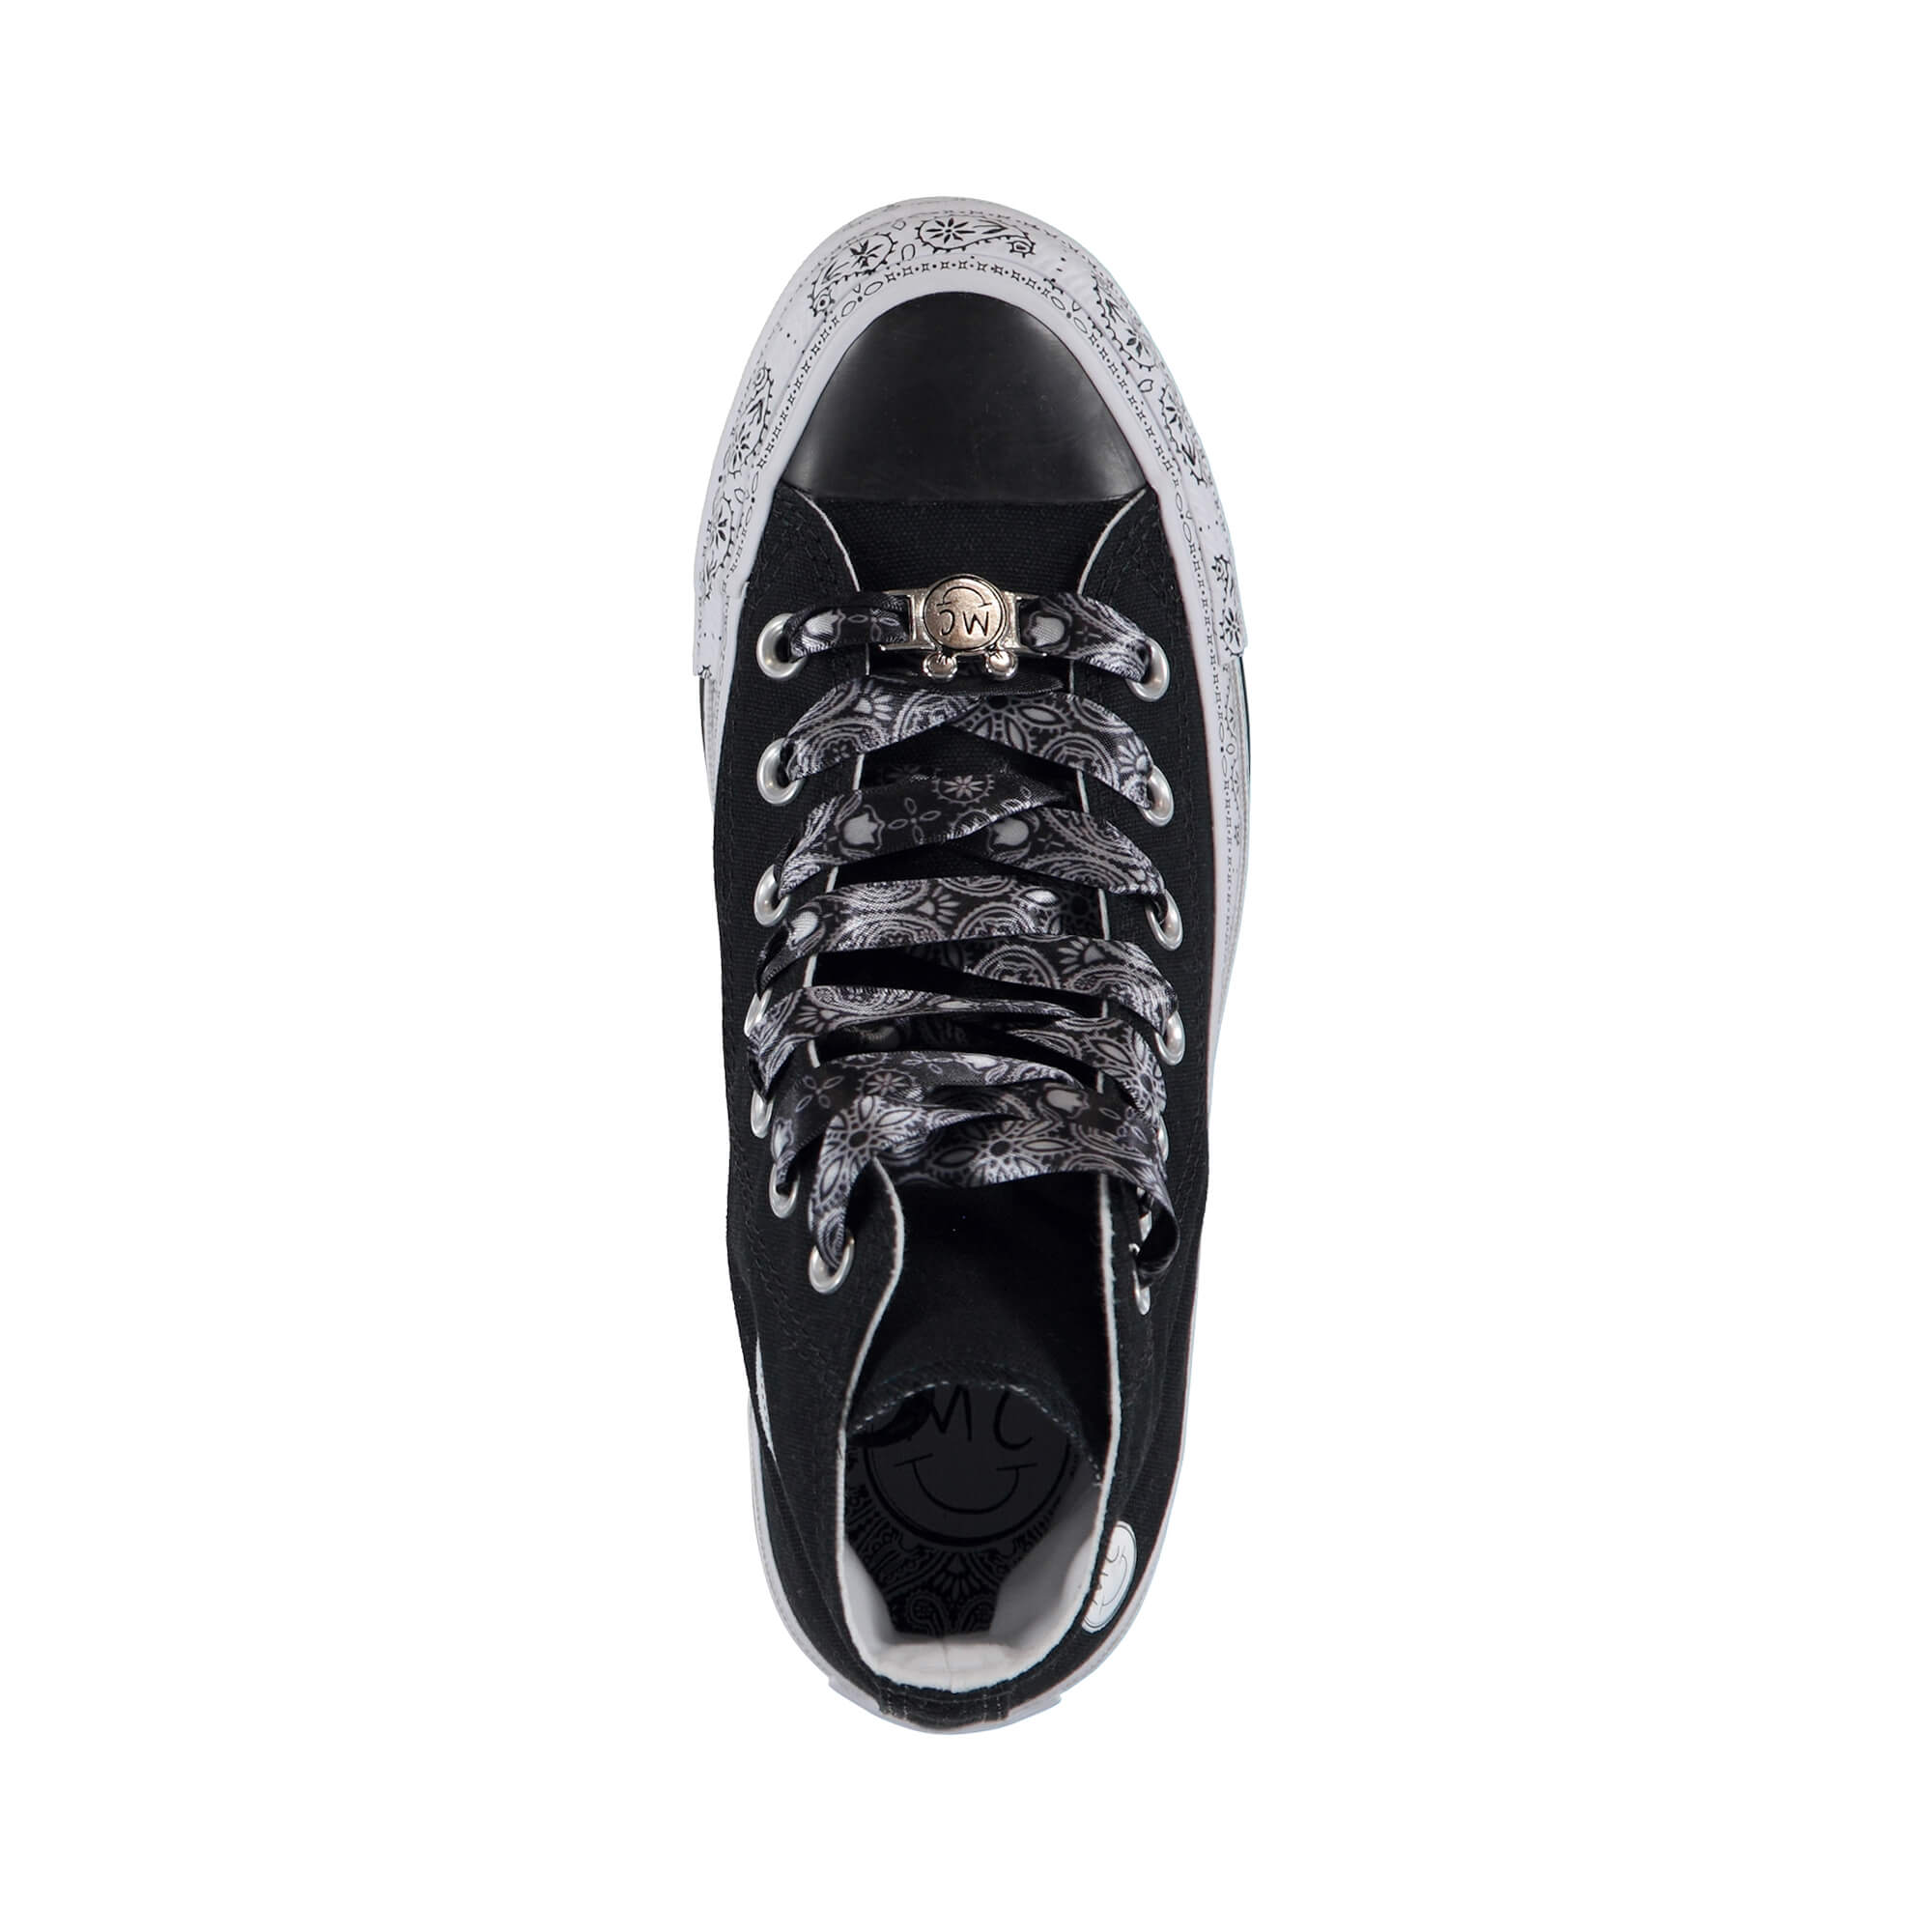 Converse X Miley Cyrus Chuck Taylor 'Bandana' Kadın Siyah Sneaker